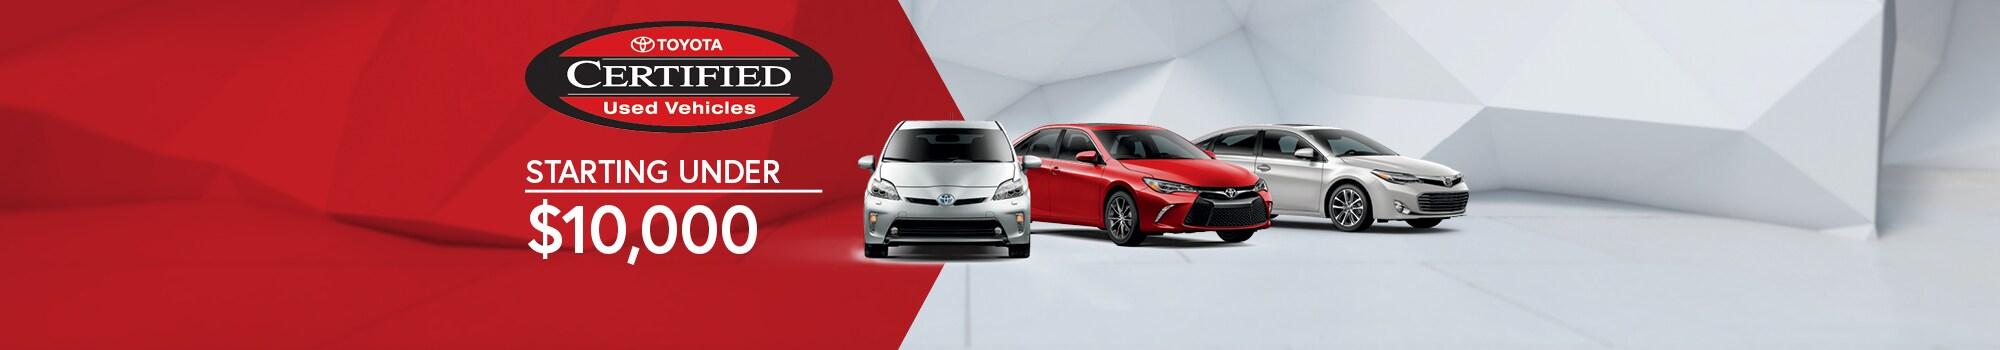 Team Toyota Of Langhorne 3 Source · Team Toyota Langhorne Pa Best Toyota  Series 2018